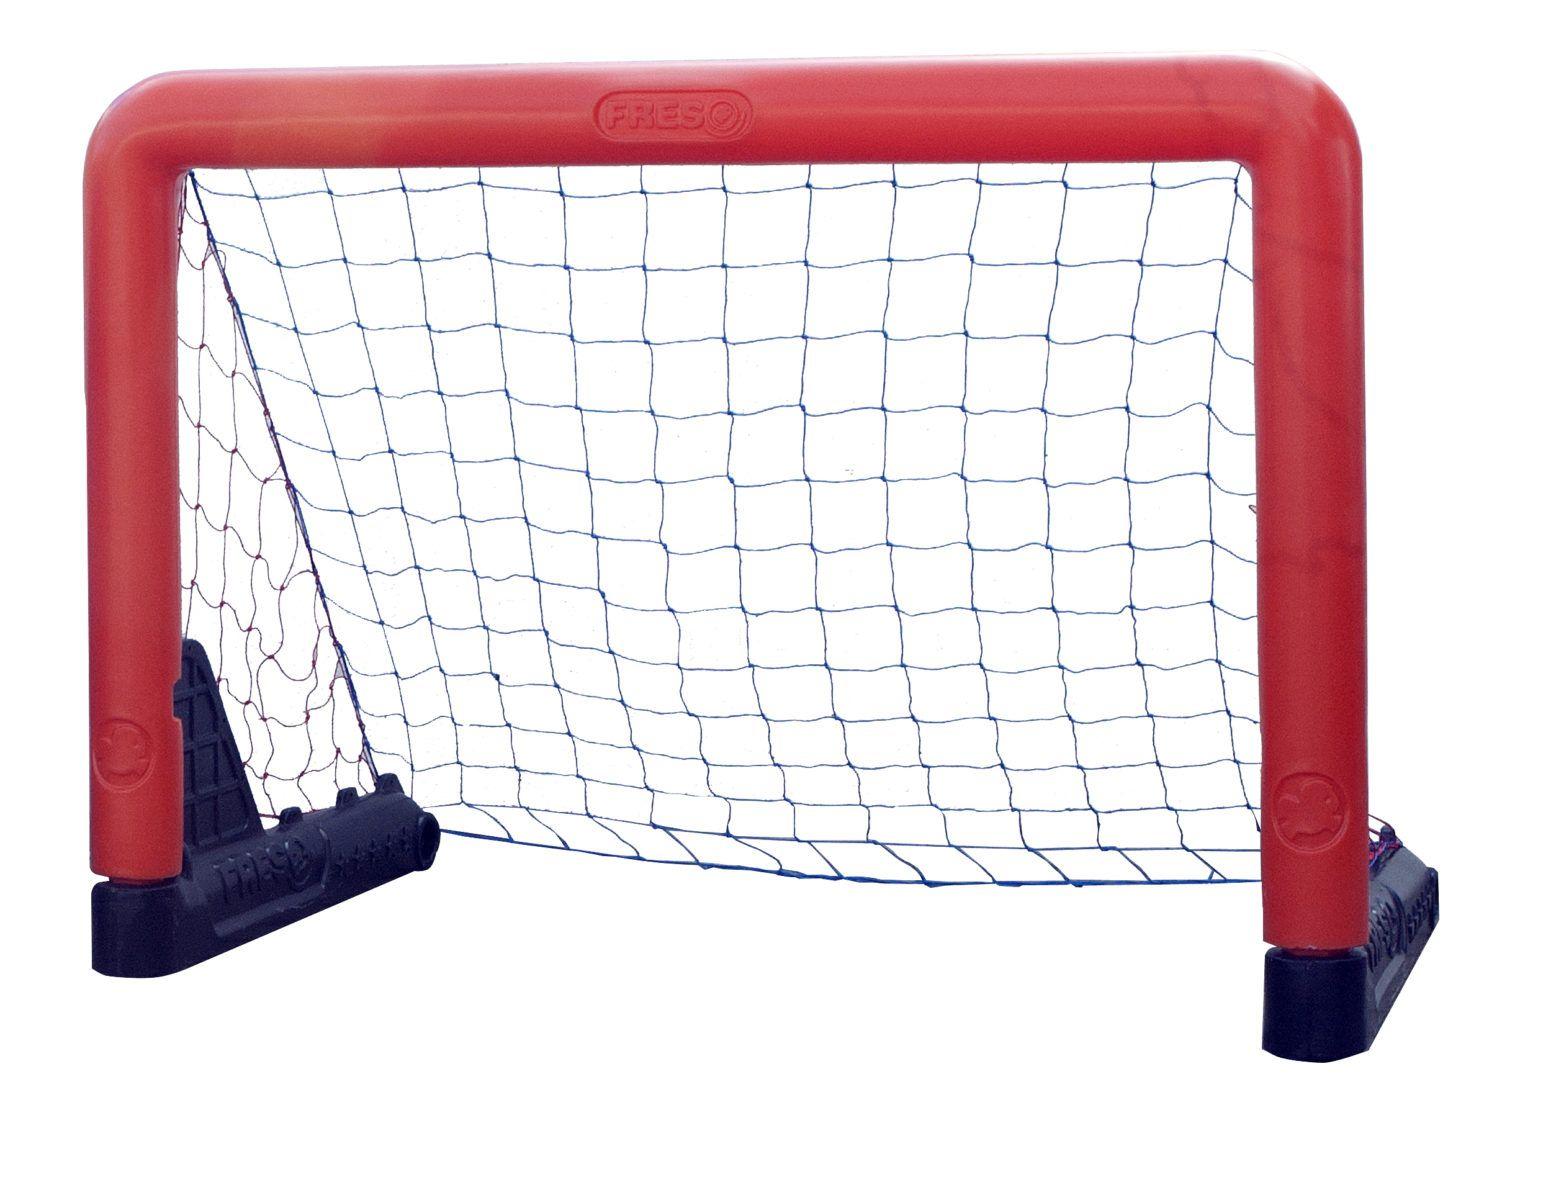 Trave Gol Dobrável | 1m28 x 1m x 28cm